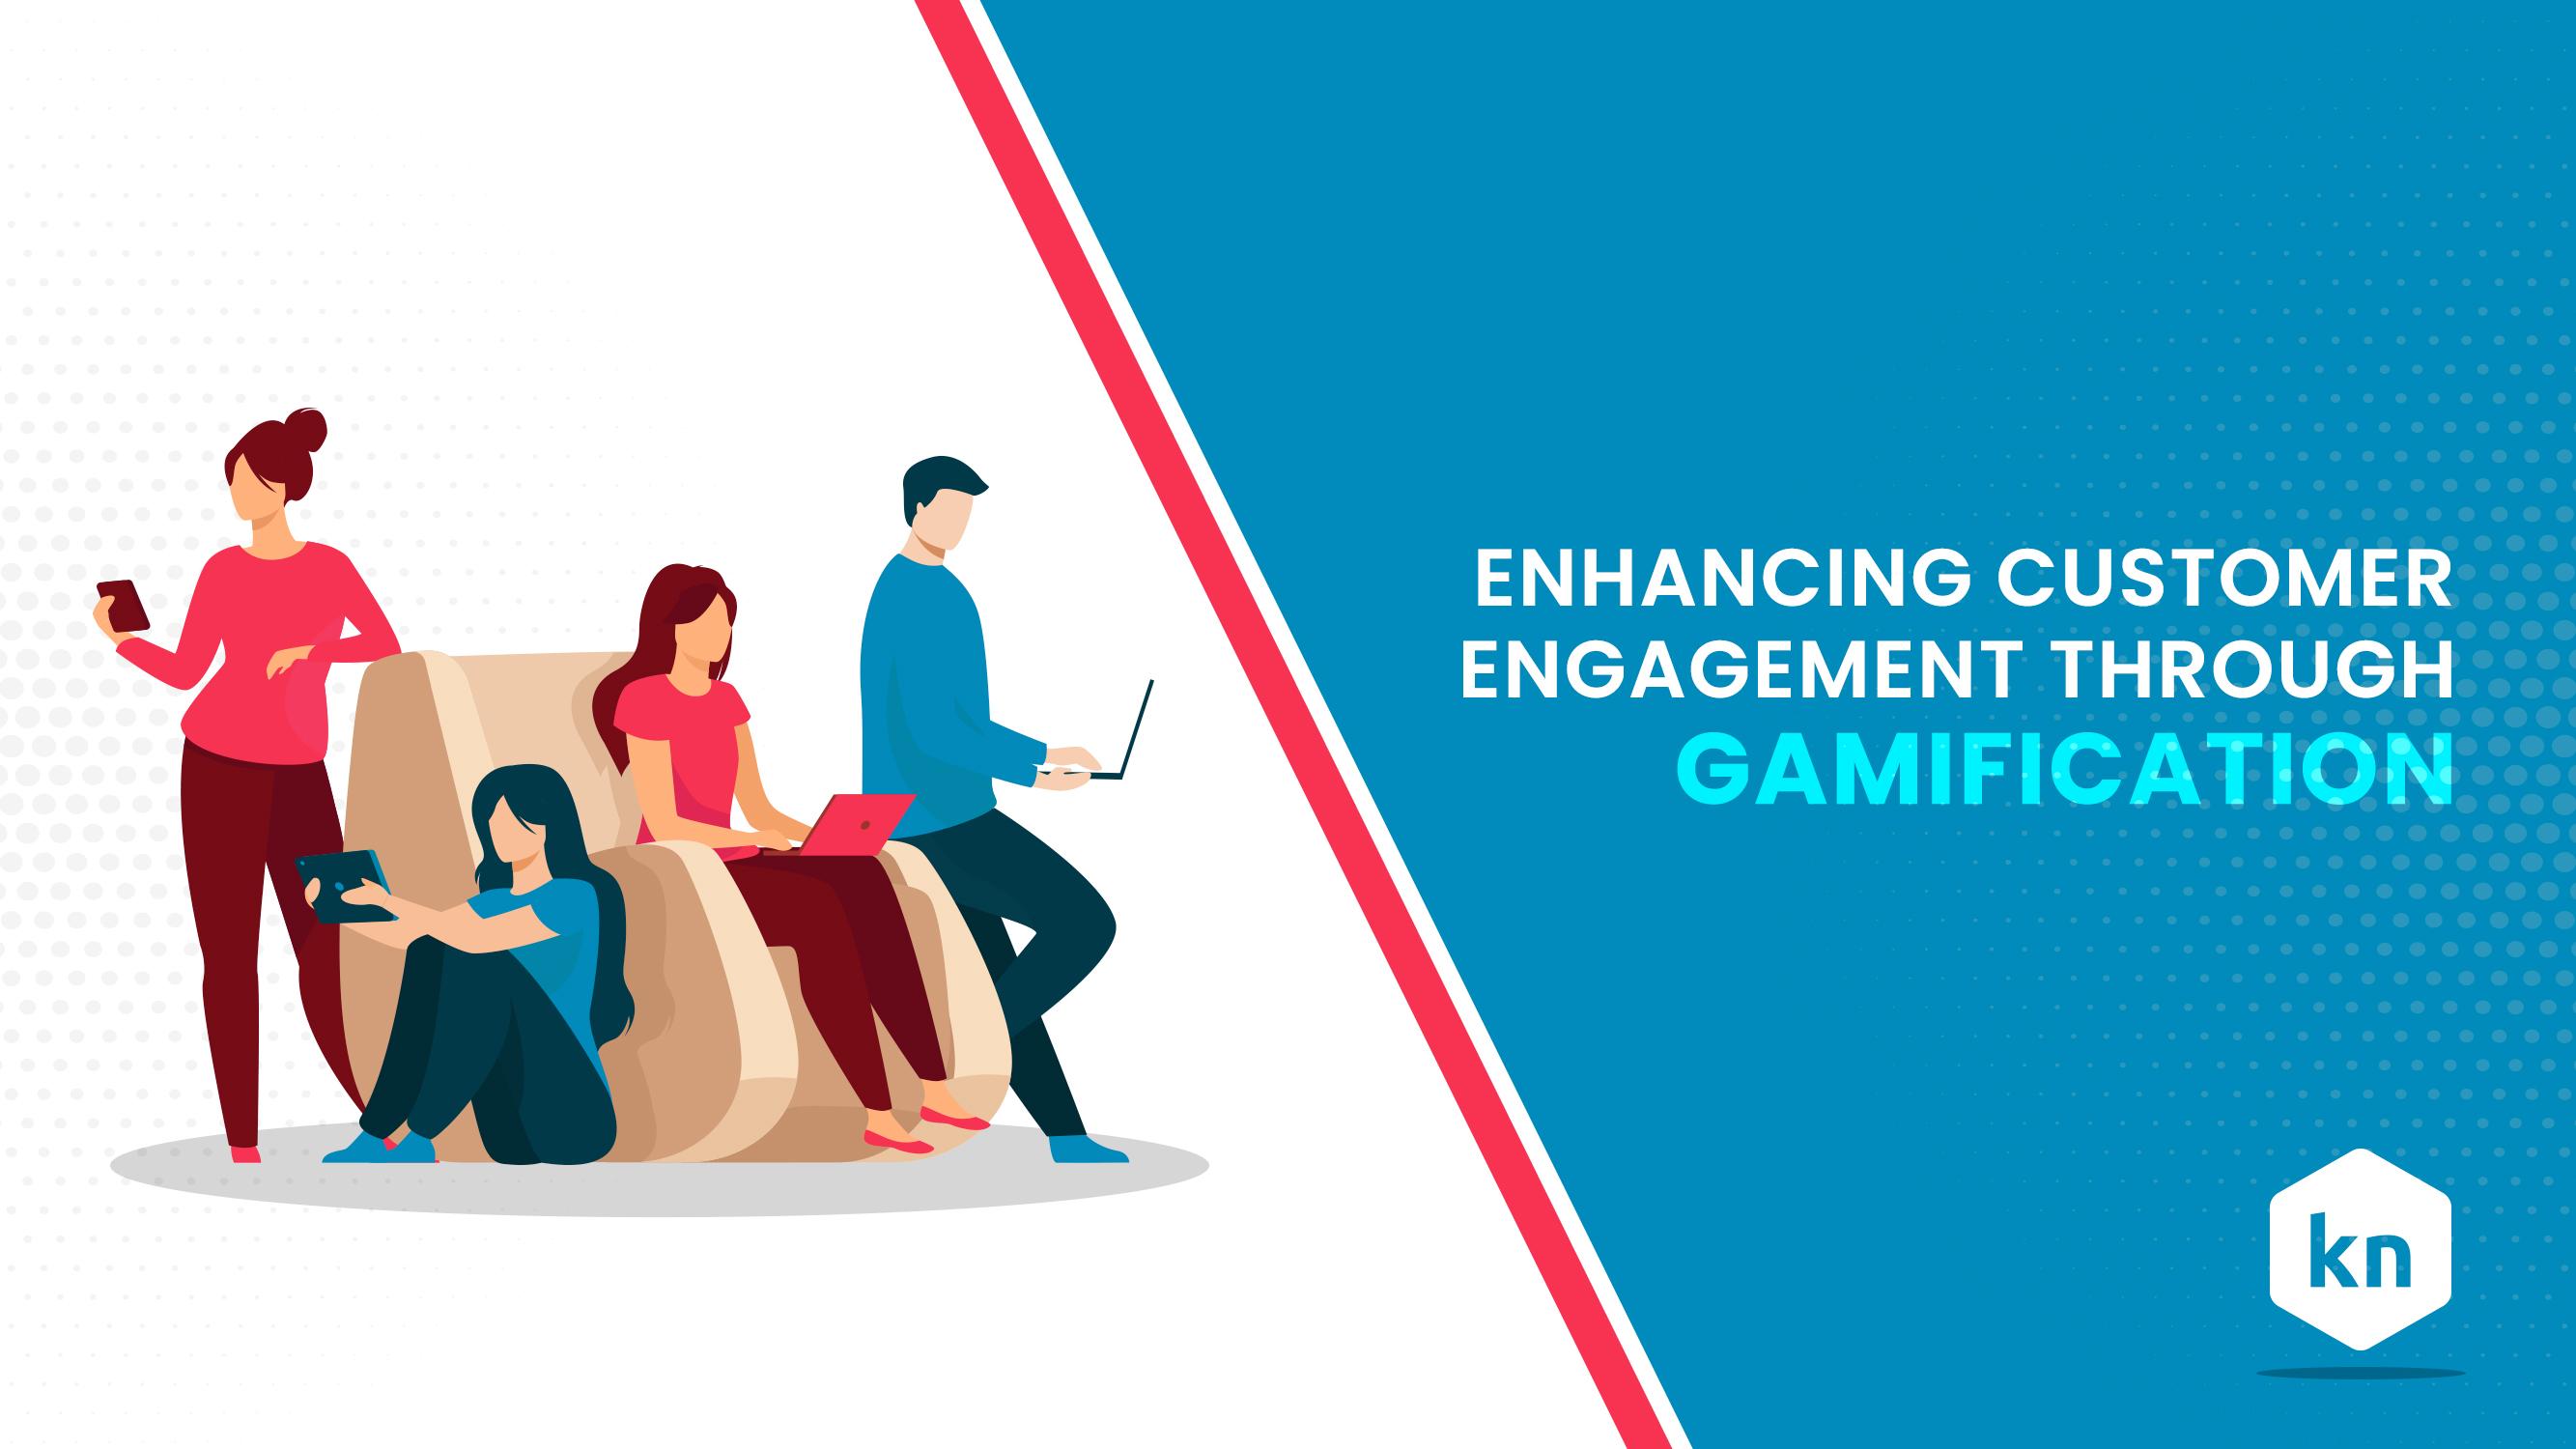 Enhancing Customer Engagement through Gamification